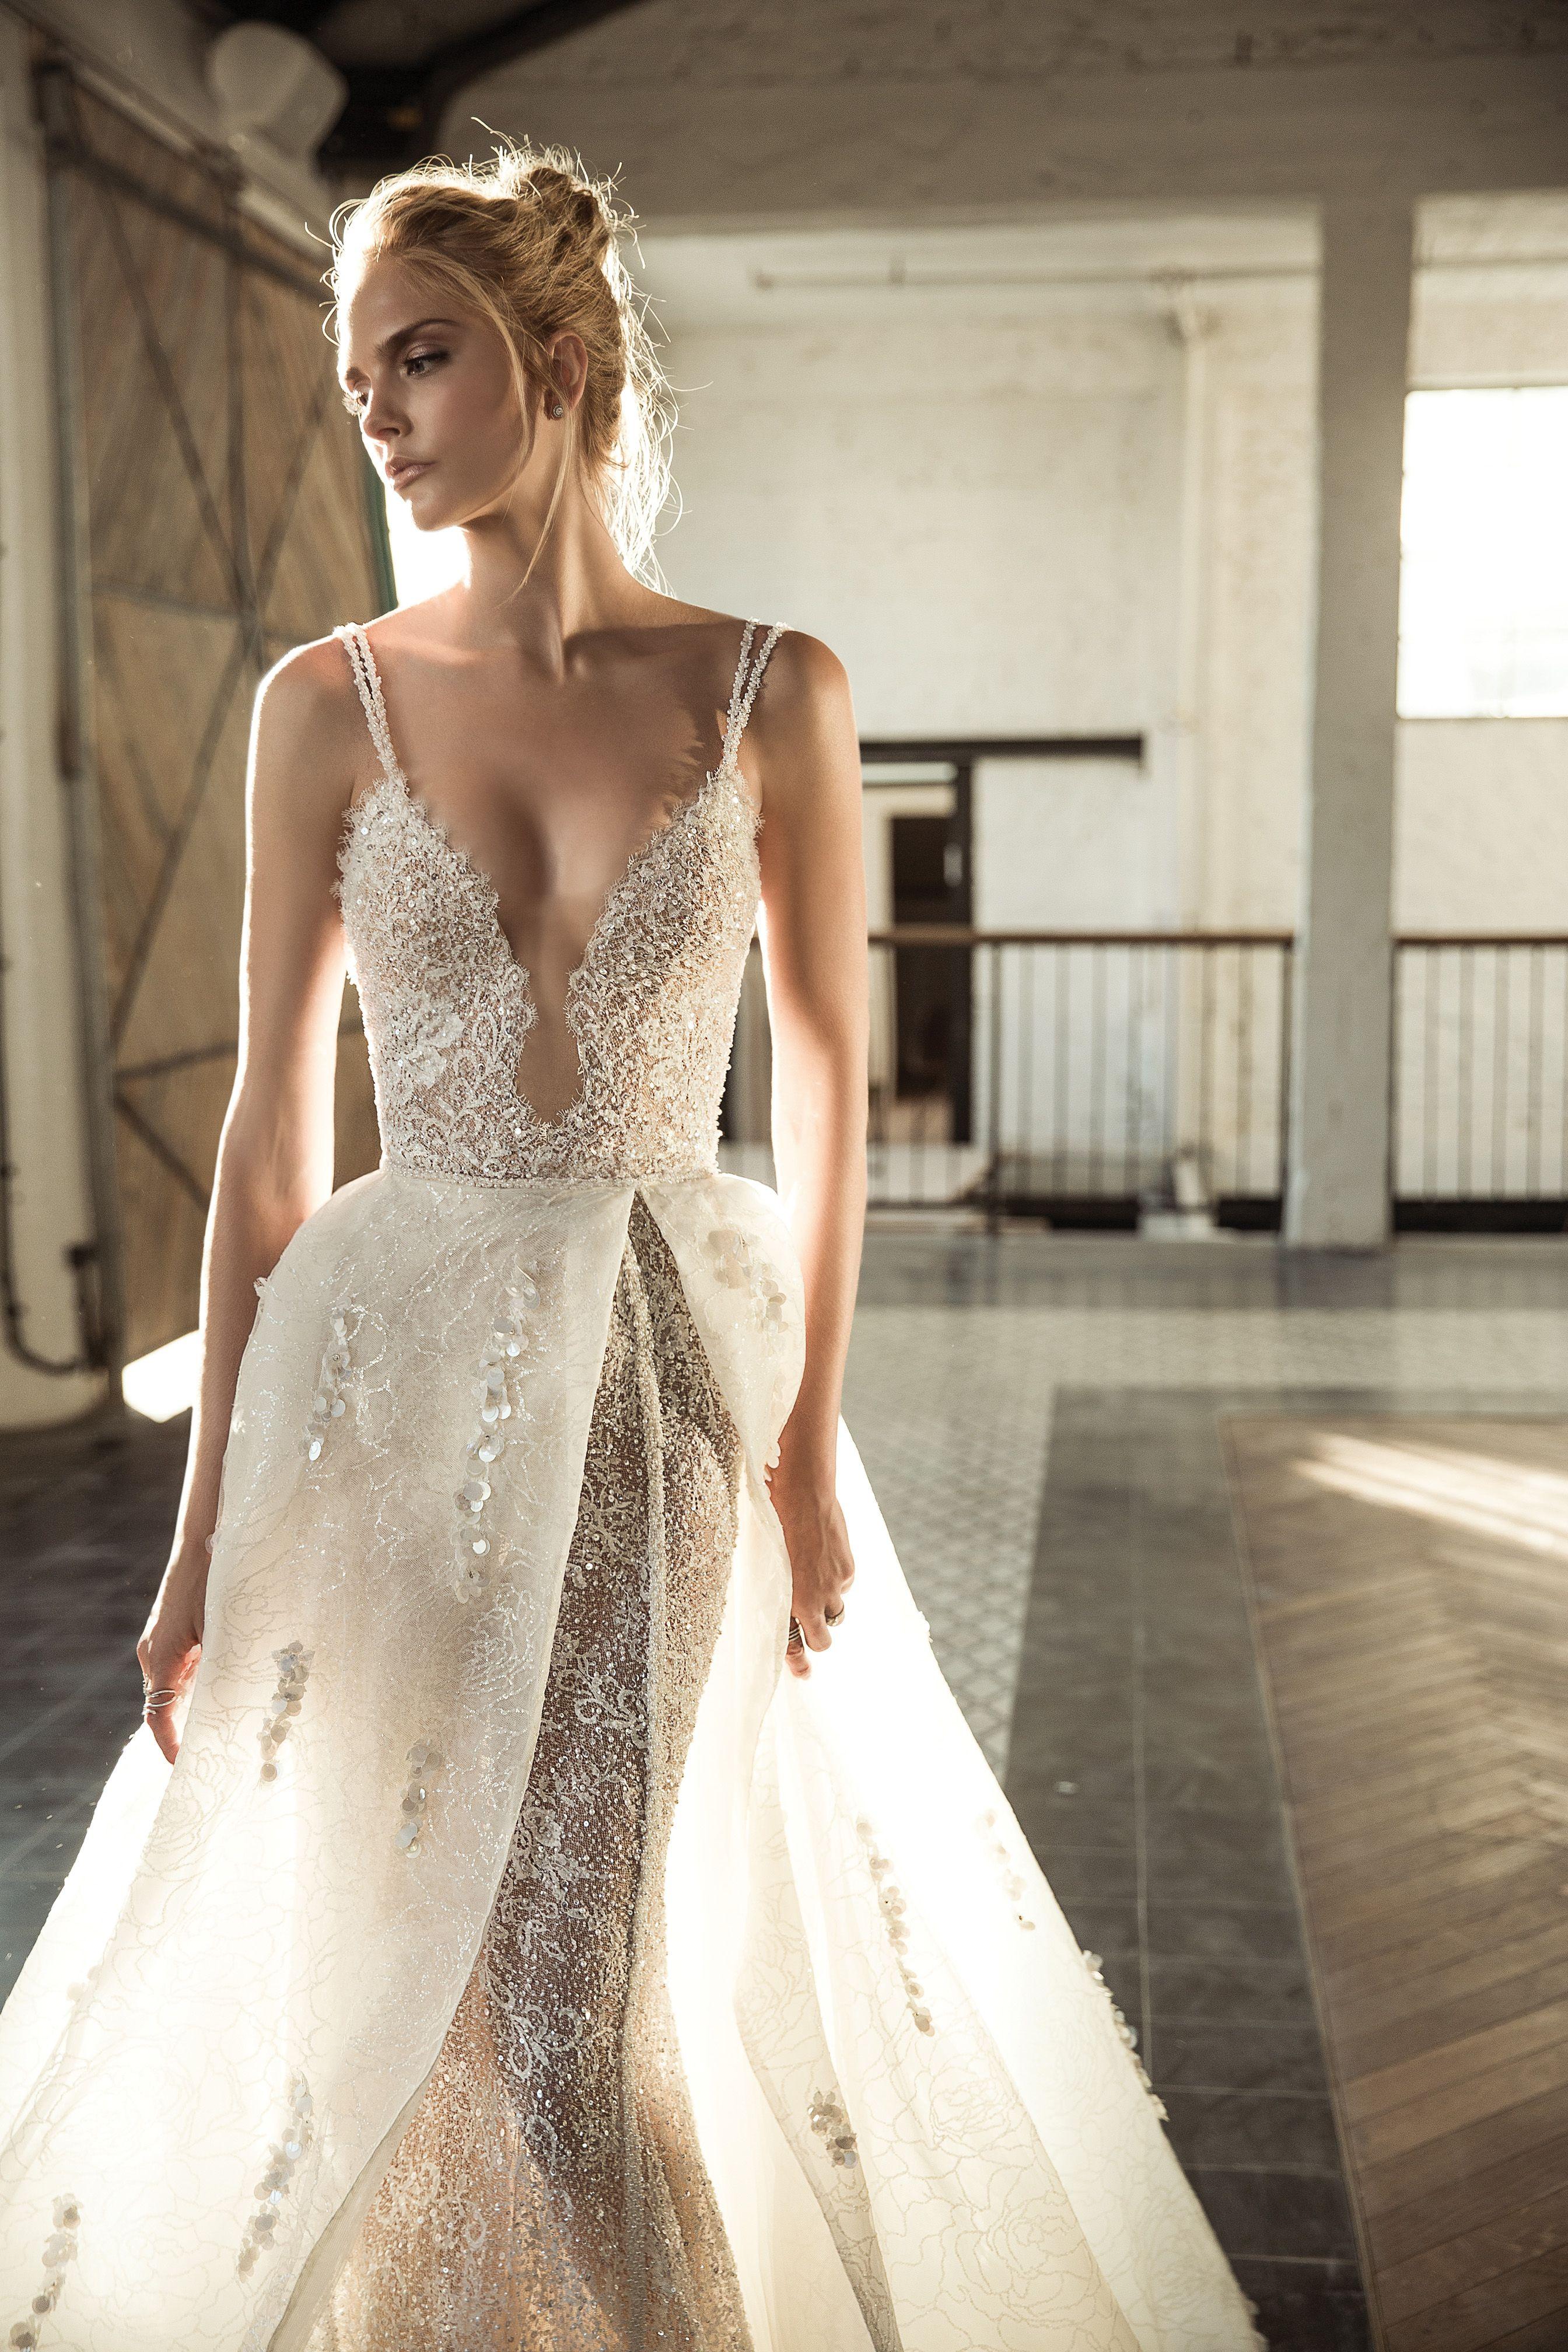 weddingcouture #bridalcouture #weddinggown #leepetragrebenau   2017 ...